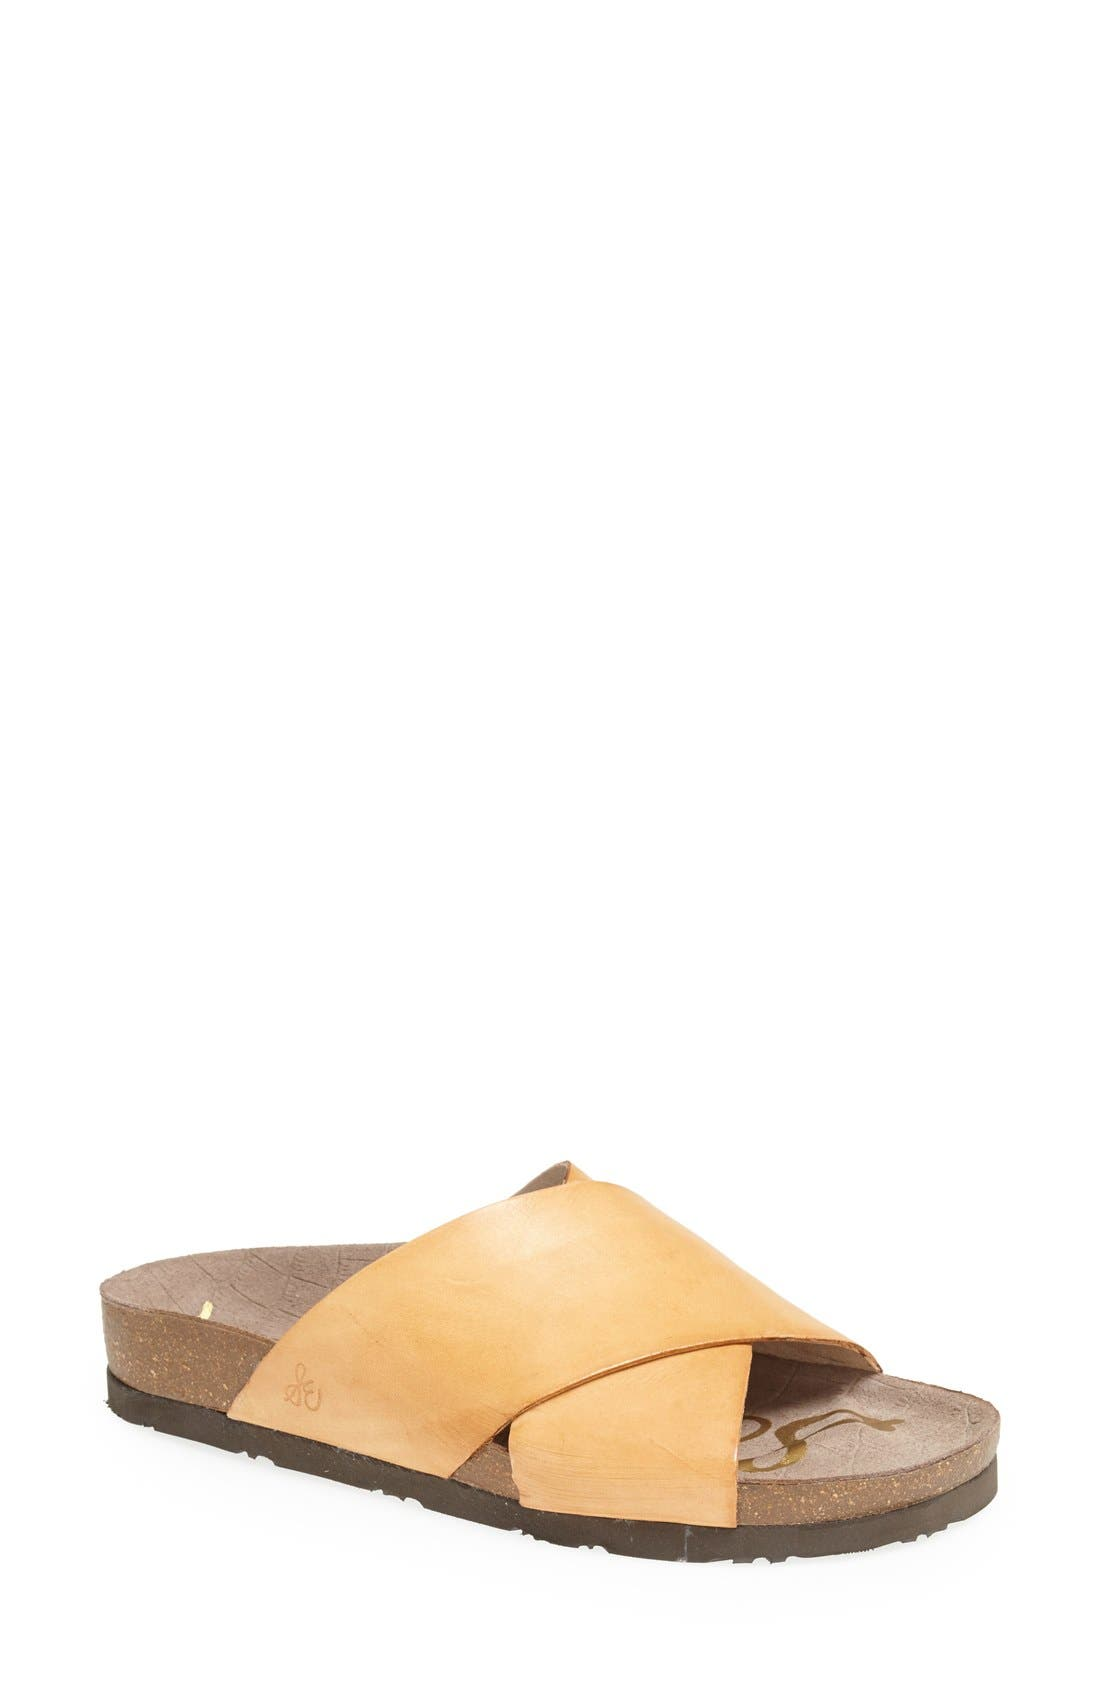 Alternate Image 1 Selected - Sam Edelman 'Adora' Sandal